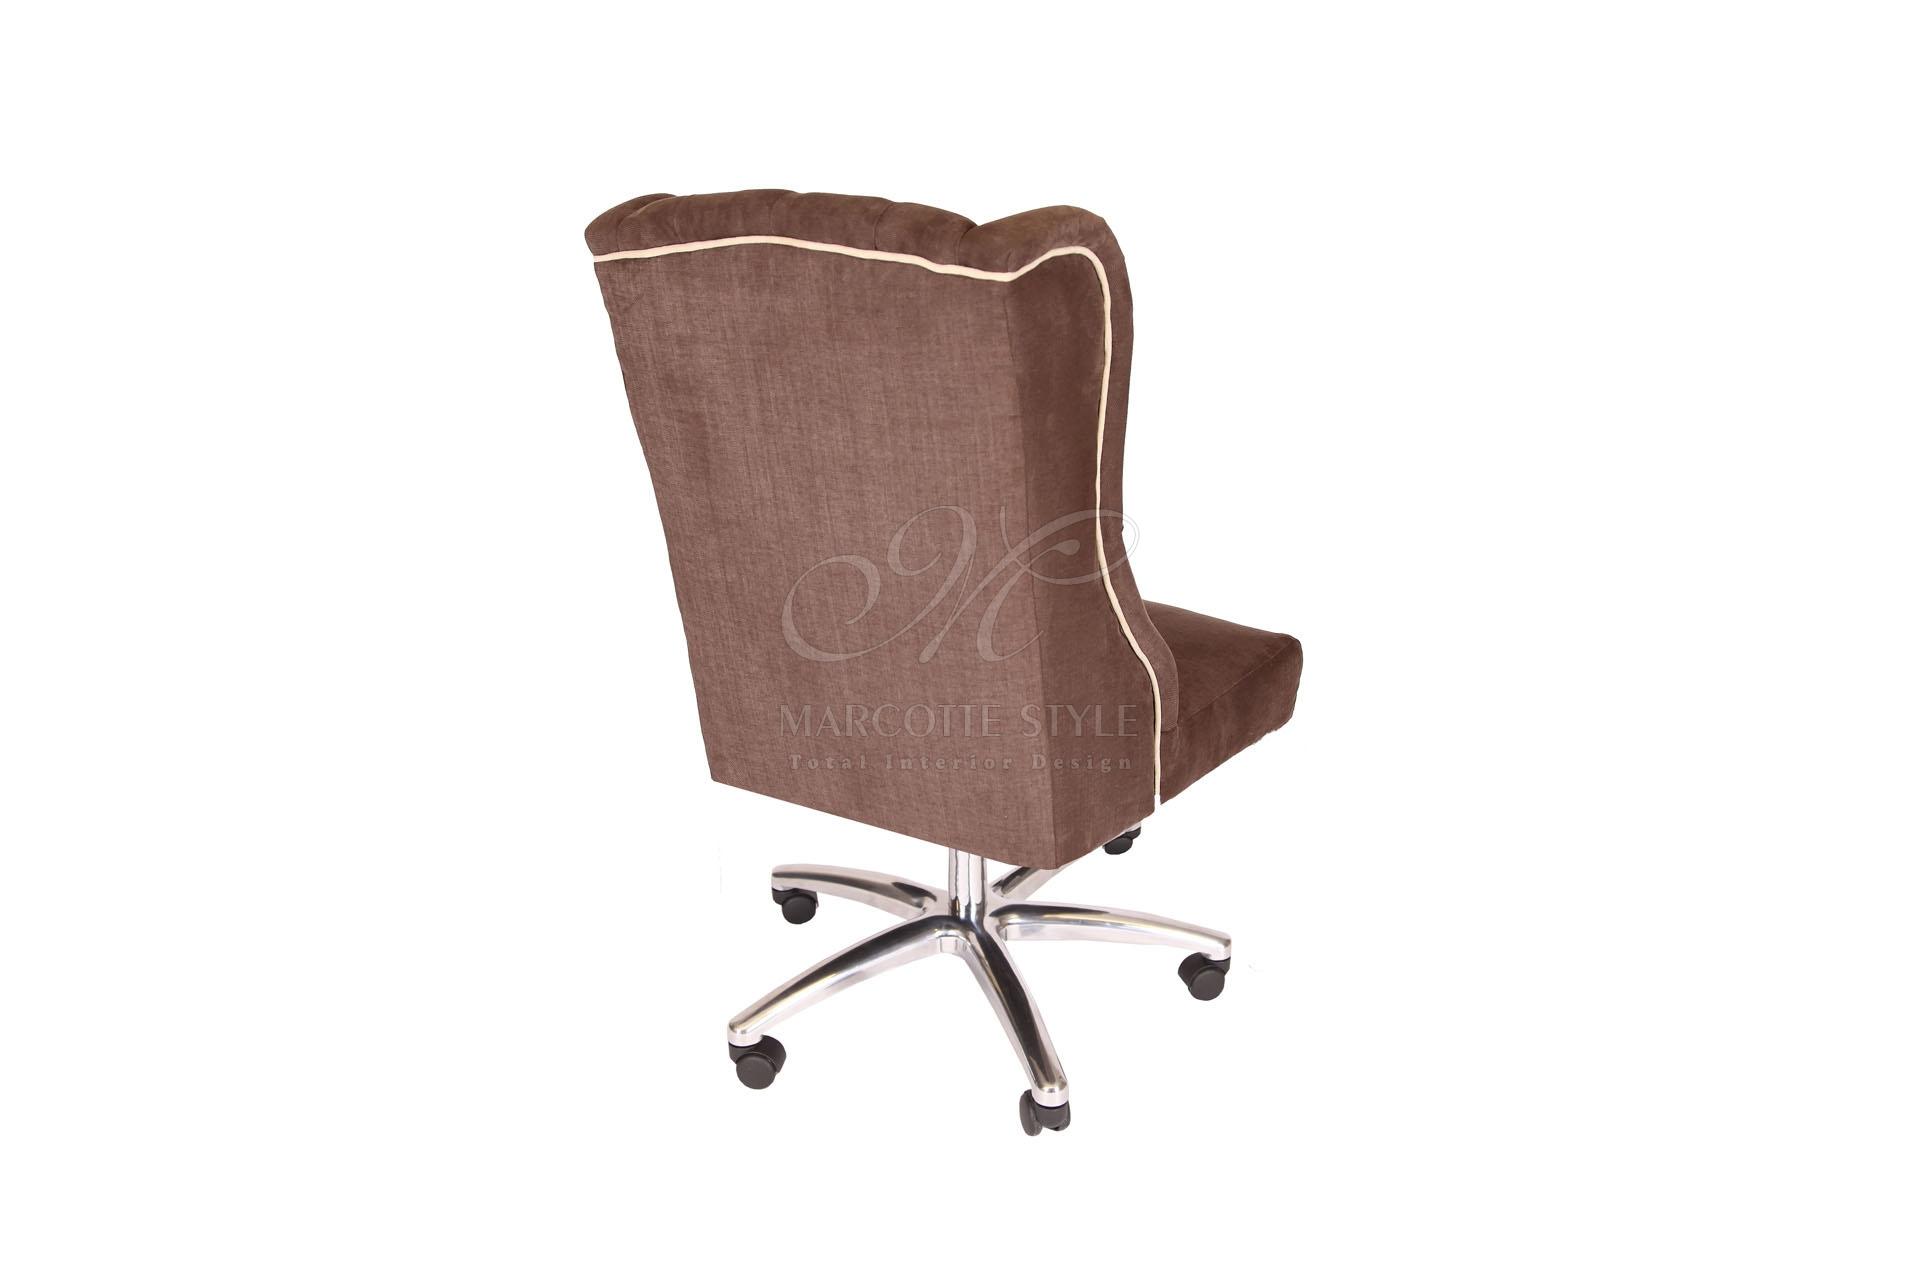 Marcottestyle dimitri officechair bureau stoel marcotte style